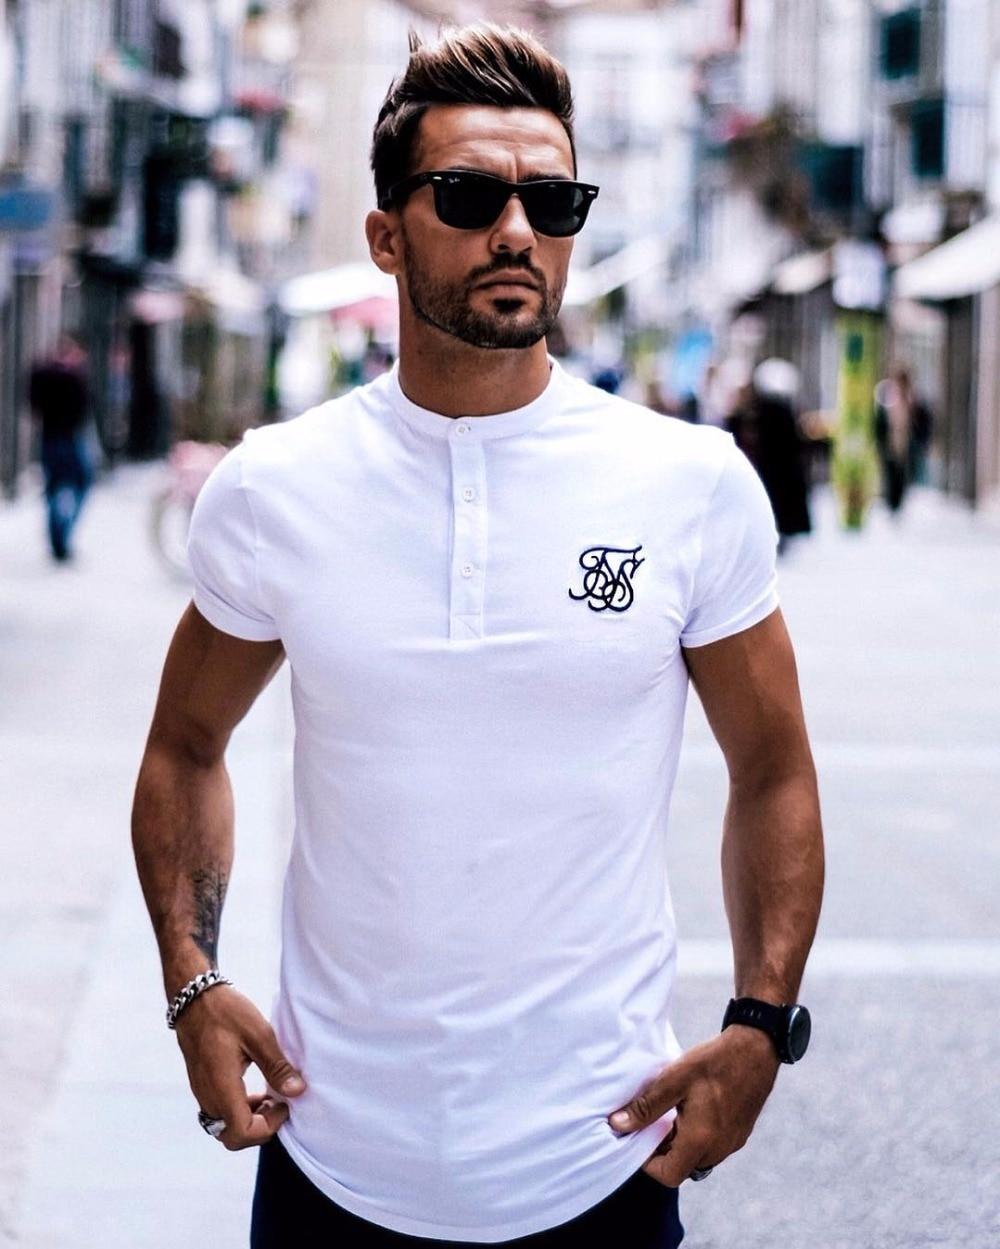 New 2019 Men Brand Fashion Summer Kanye West Sik Silk Mens Casual Hip Hop Irregular Cut Button Short Sleeved T-shirt Black White